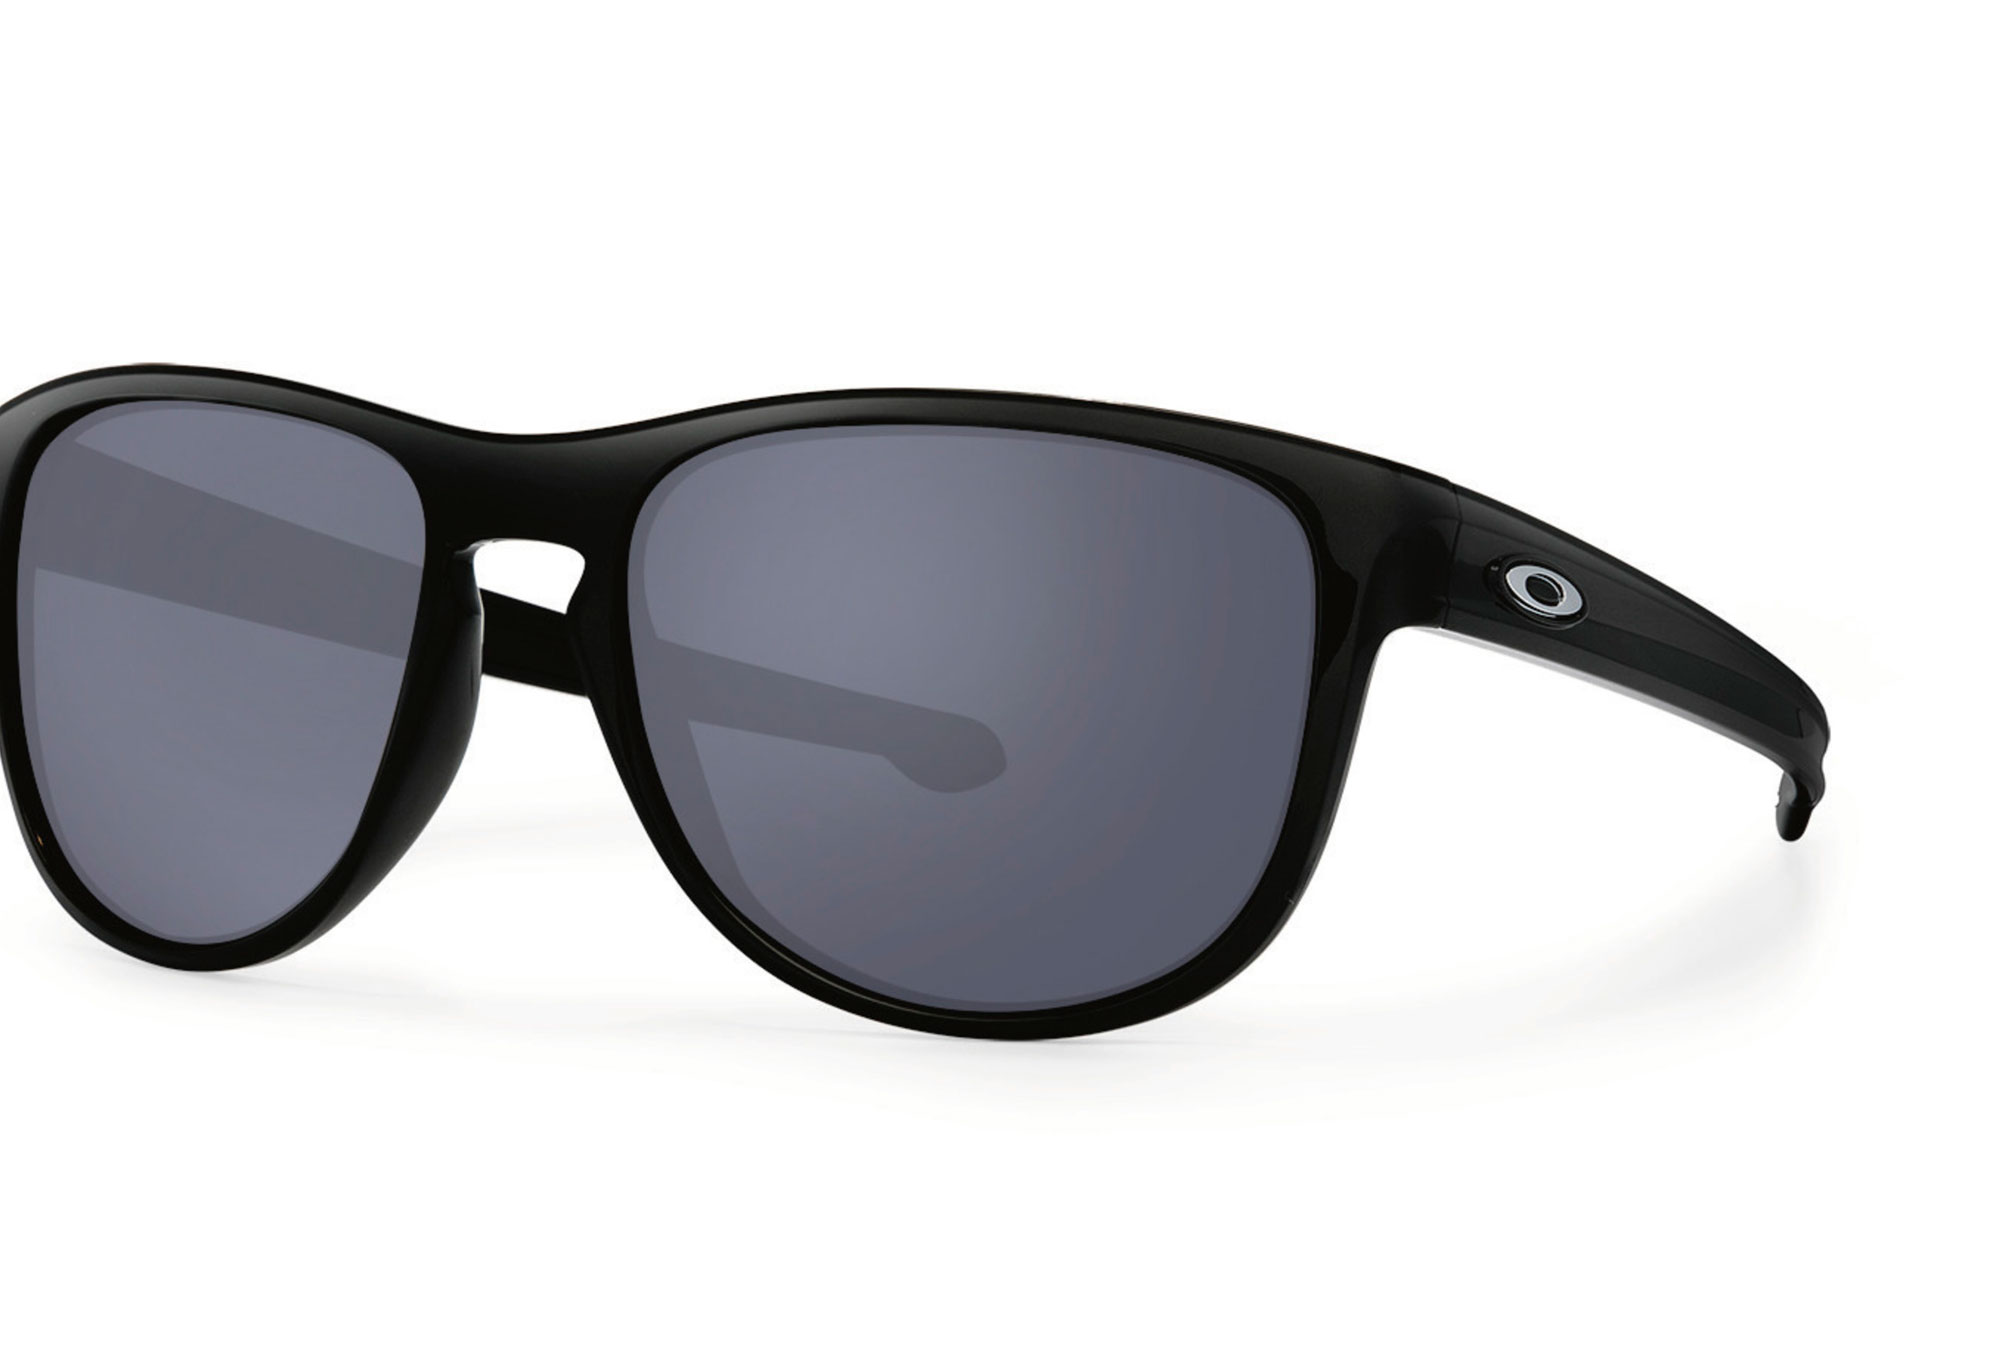 OAKLEY Sunglasses SLIVER R Matte Black   Grey Ref OO9342-01 ... 1dc4368b66